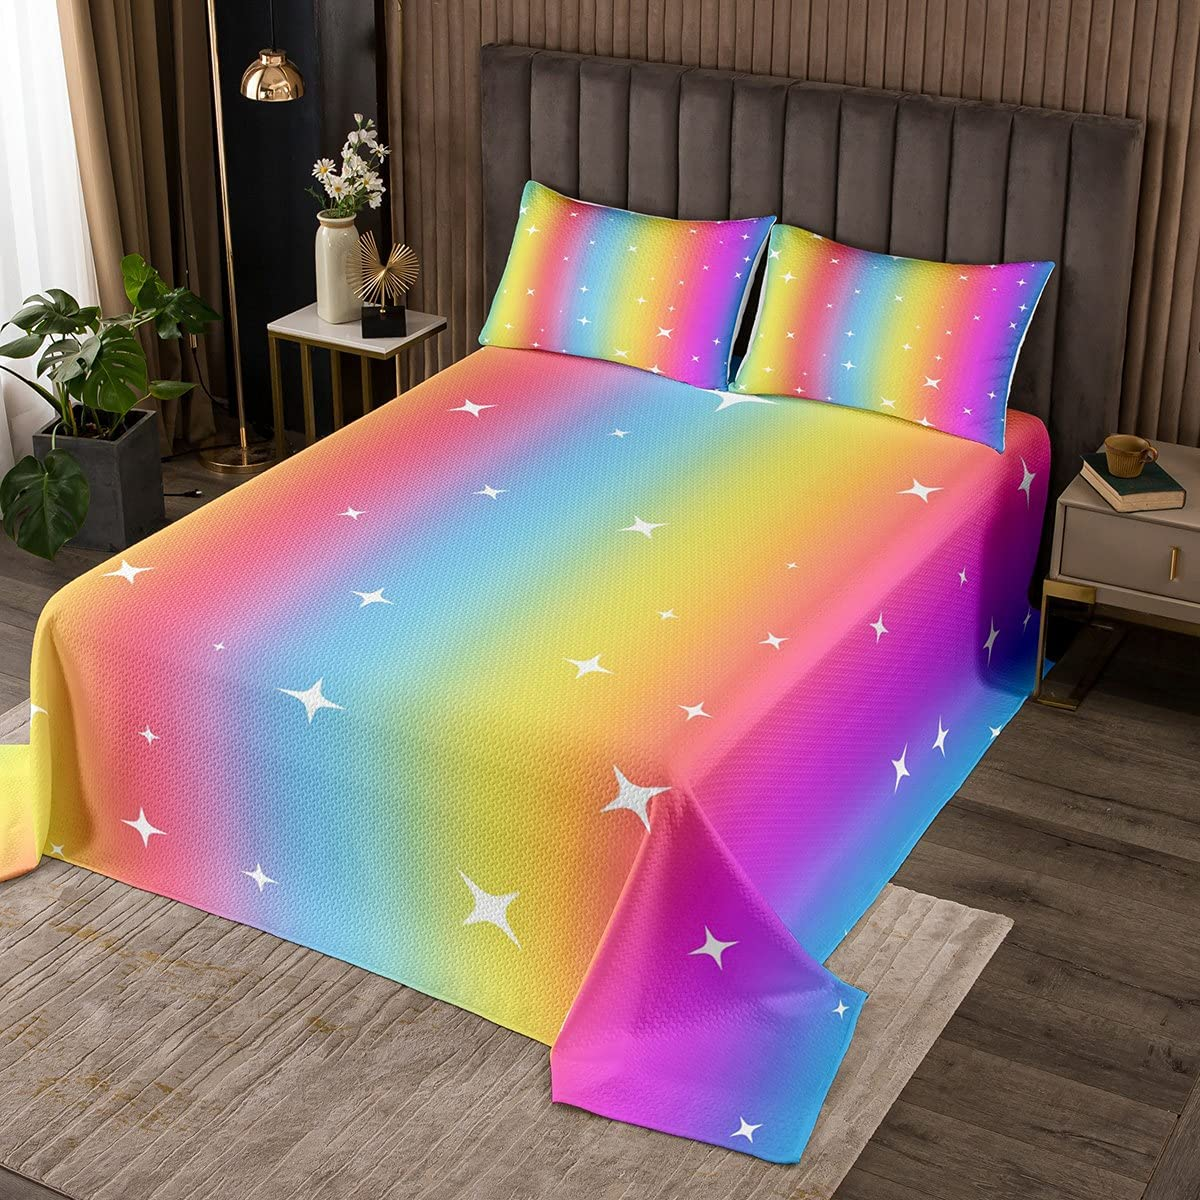 Erosebridal Colorful Gradient Bedspread King Ranking TOP18 NEW before selling Rainb for Kids Boys